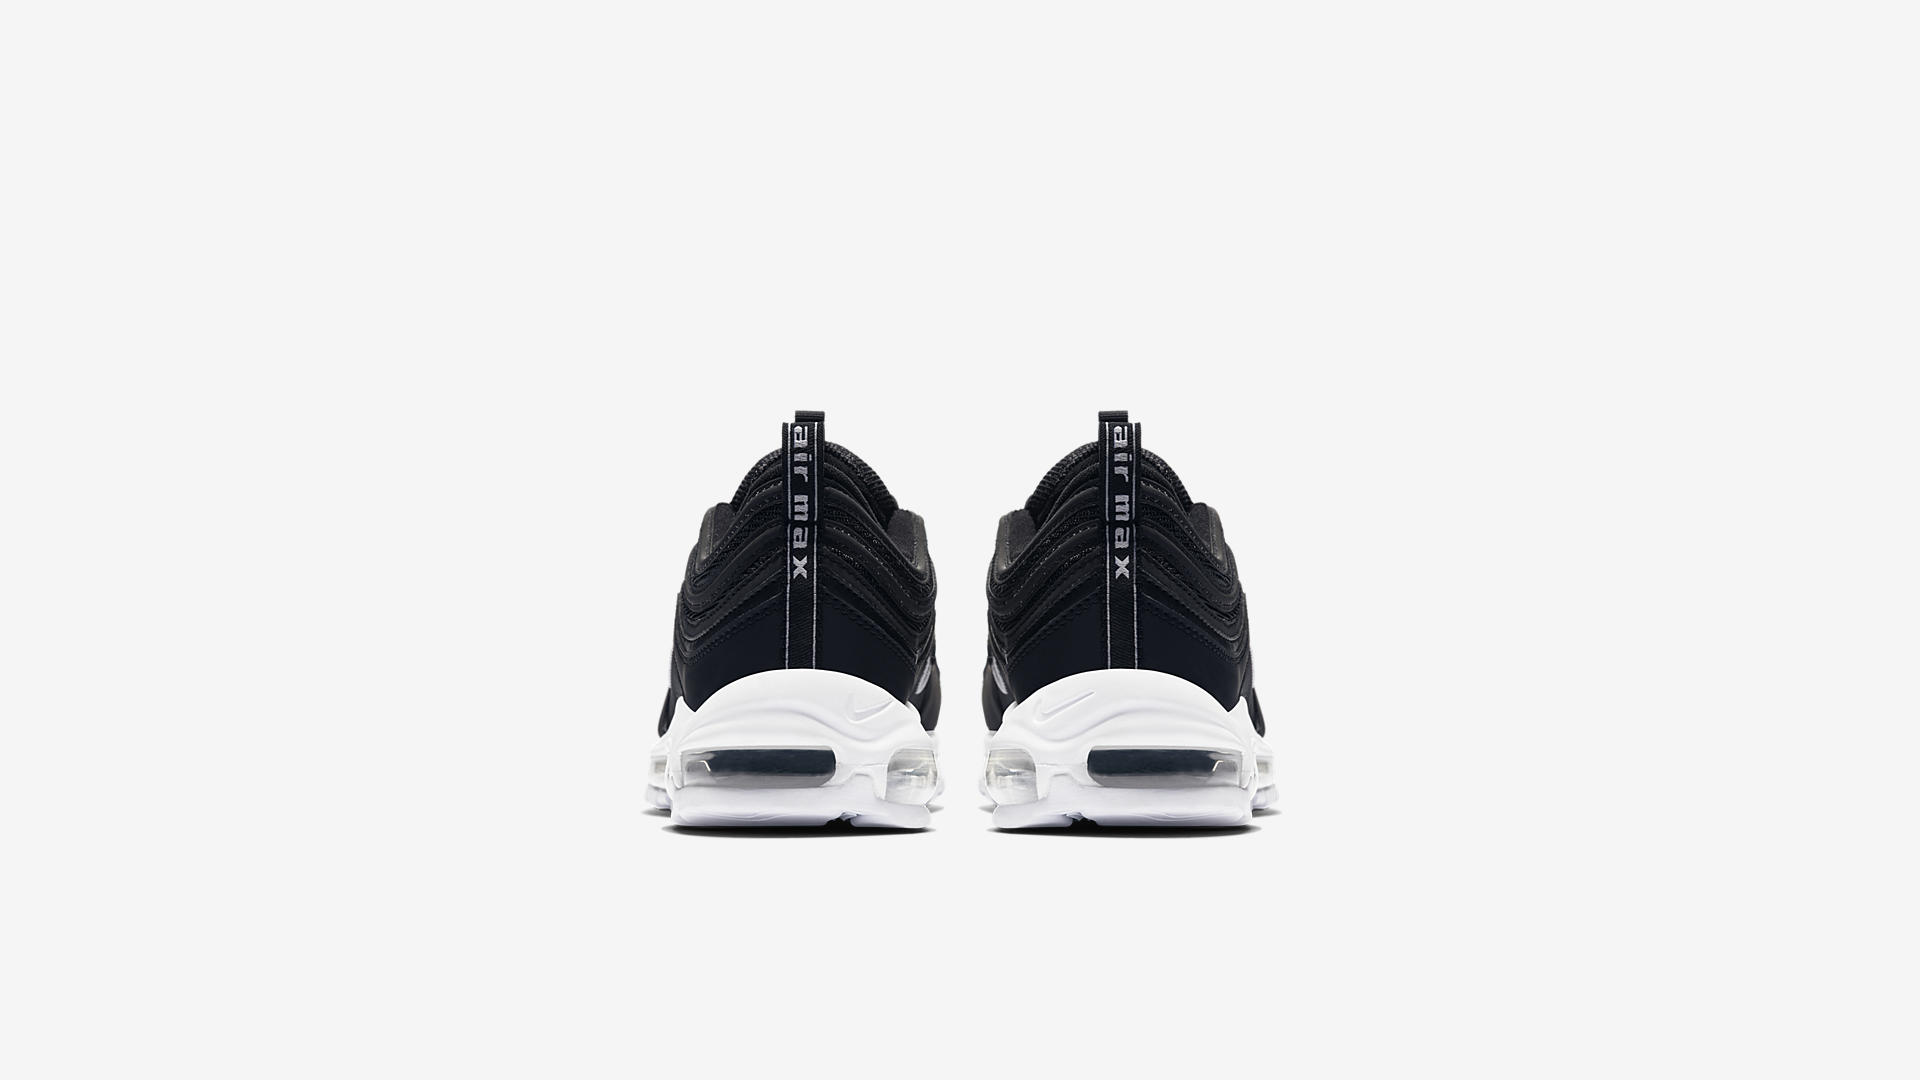 921826 001 Nike Air Max 97 Black White 2